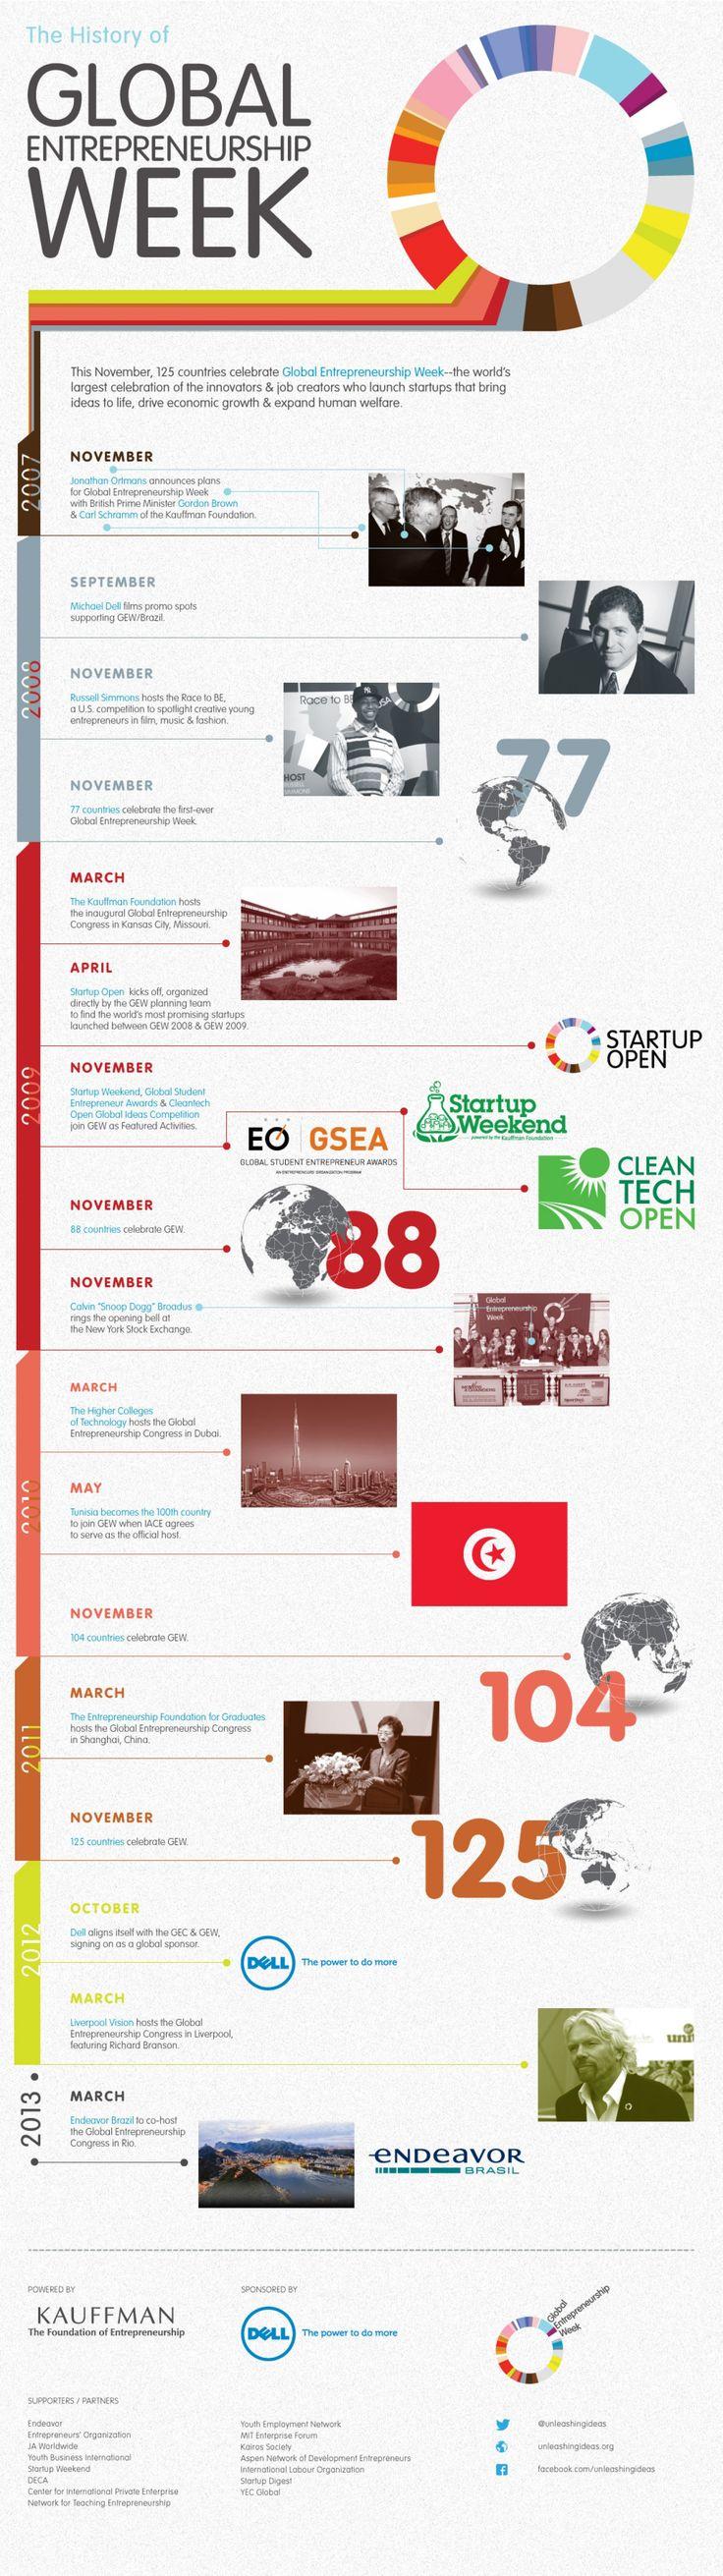 Vita Global highlights the History of Global Entrepreneurship Week!